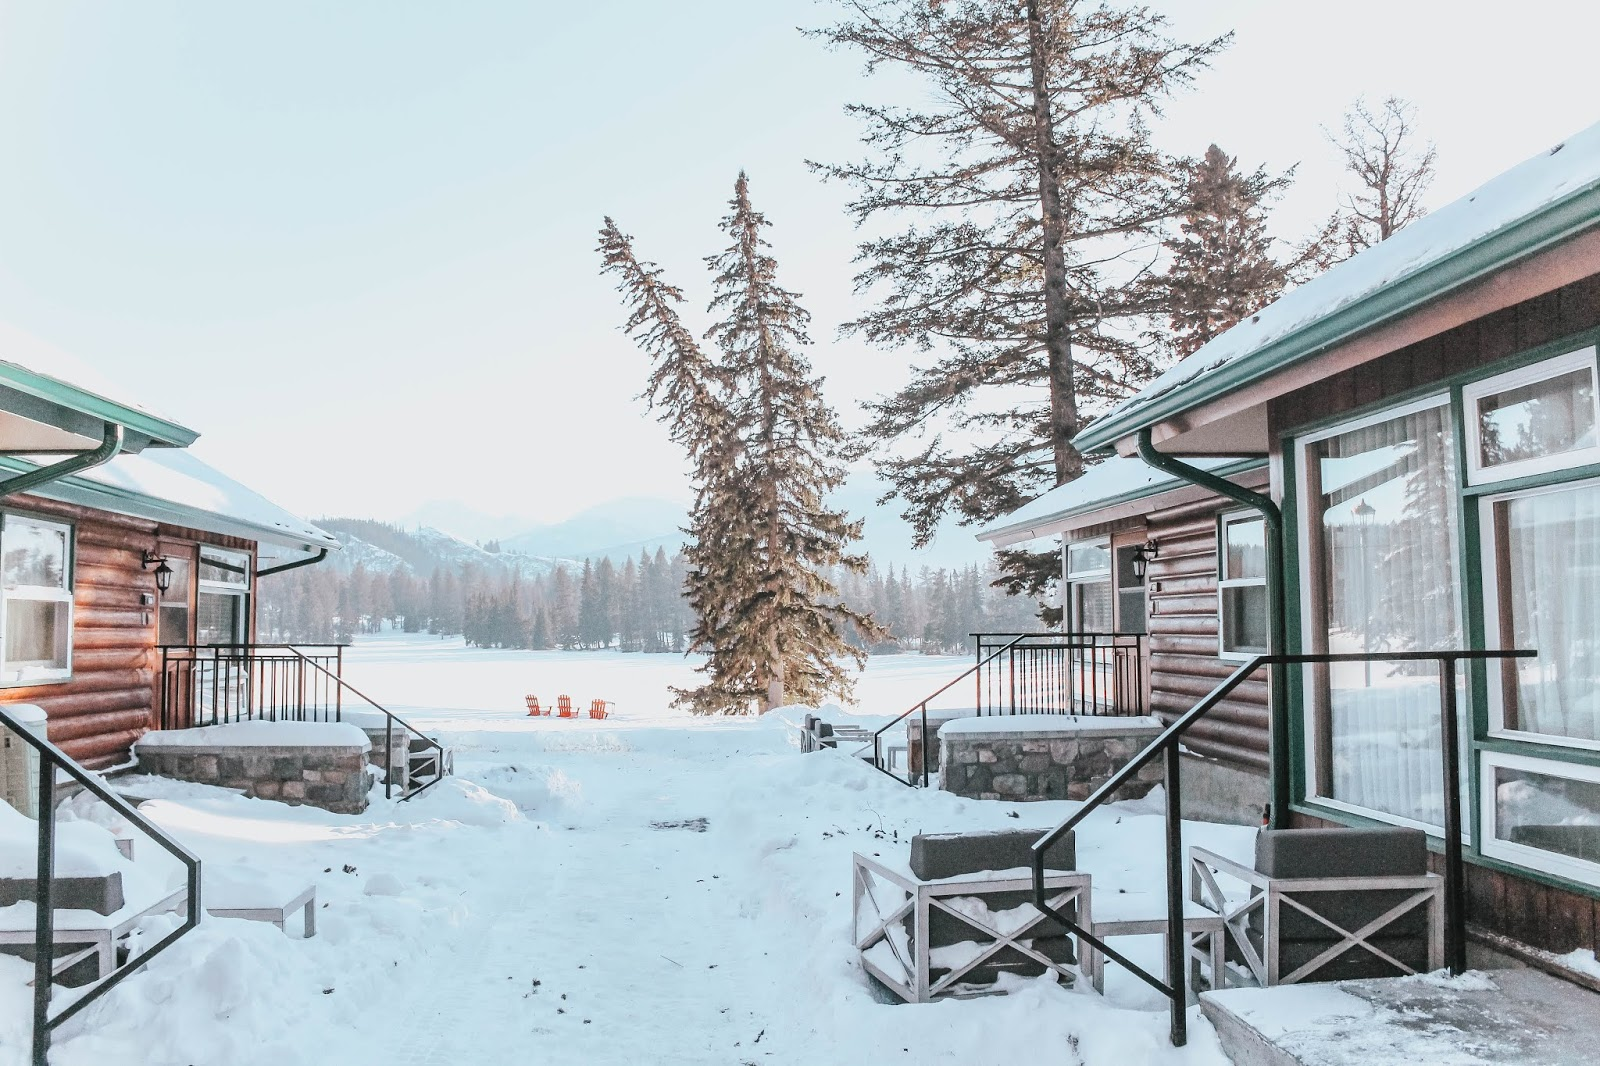 cabin, fairmont jasper park lodge, alberta, canada